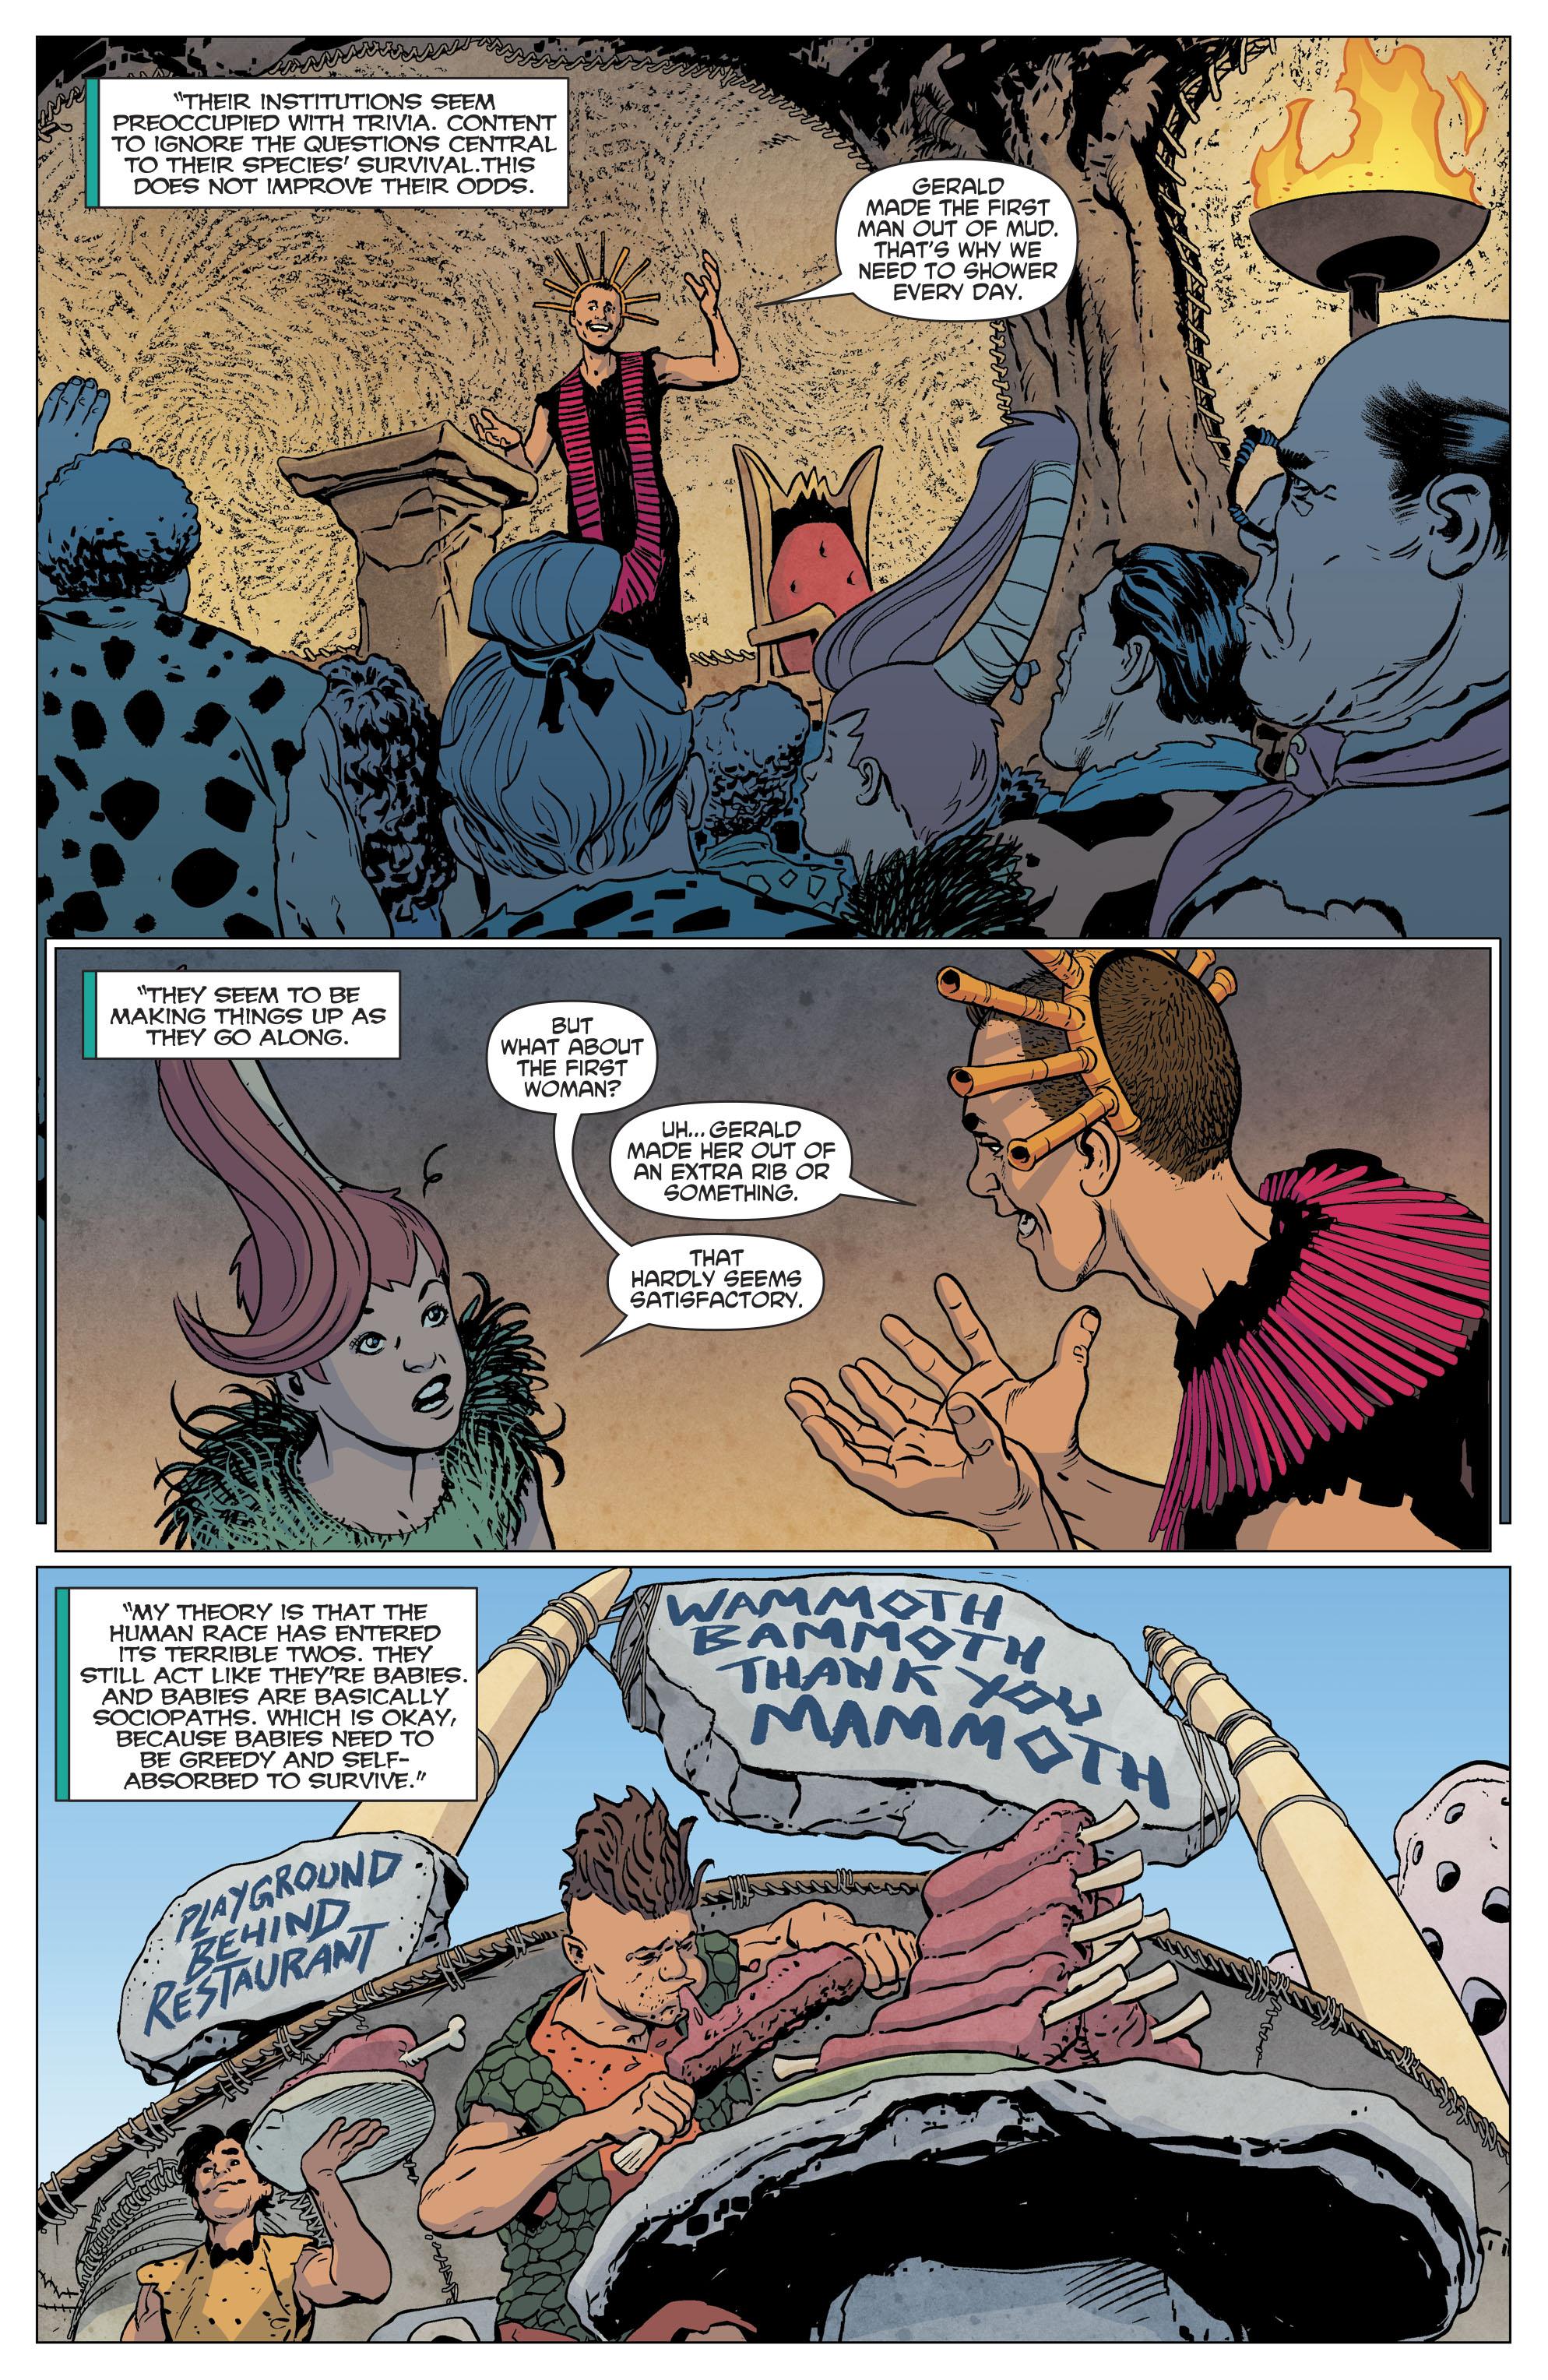 Read online The Flintstones comic -  Issue #12 - 5